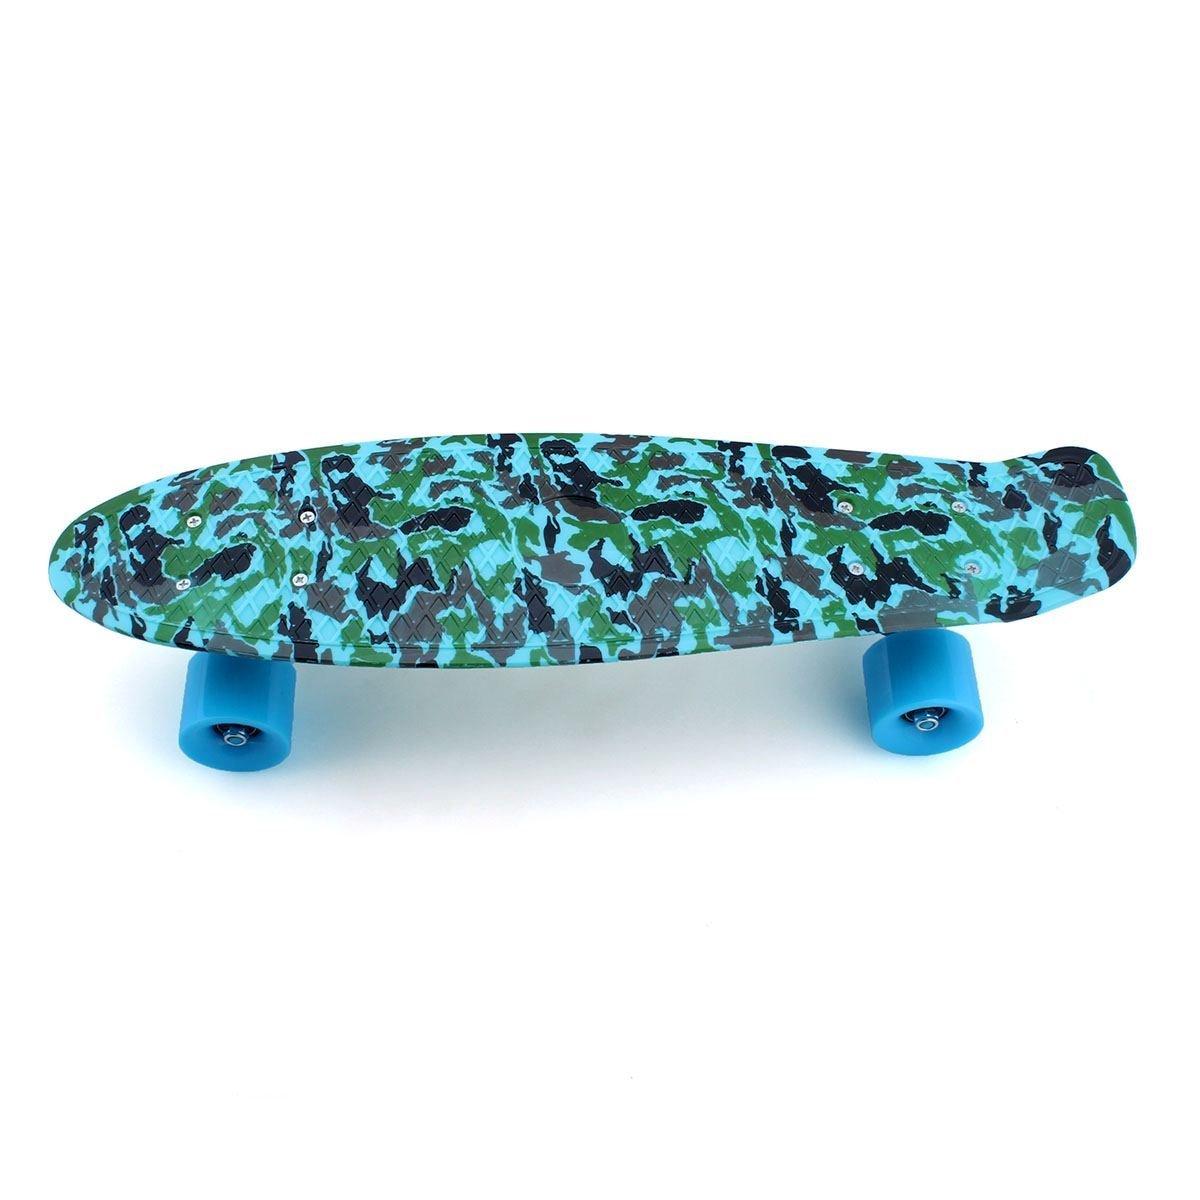 "Skateboards skateboards for kids Mini Board Complete 22"" Retro Skateboards New For Penny Style Plastic skateboards skateboards for boys/girls Ocean"